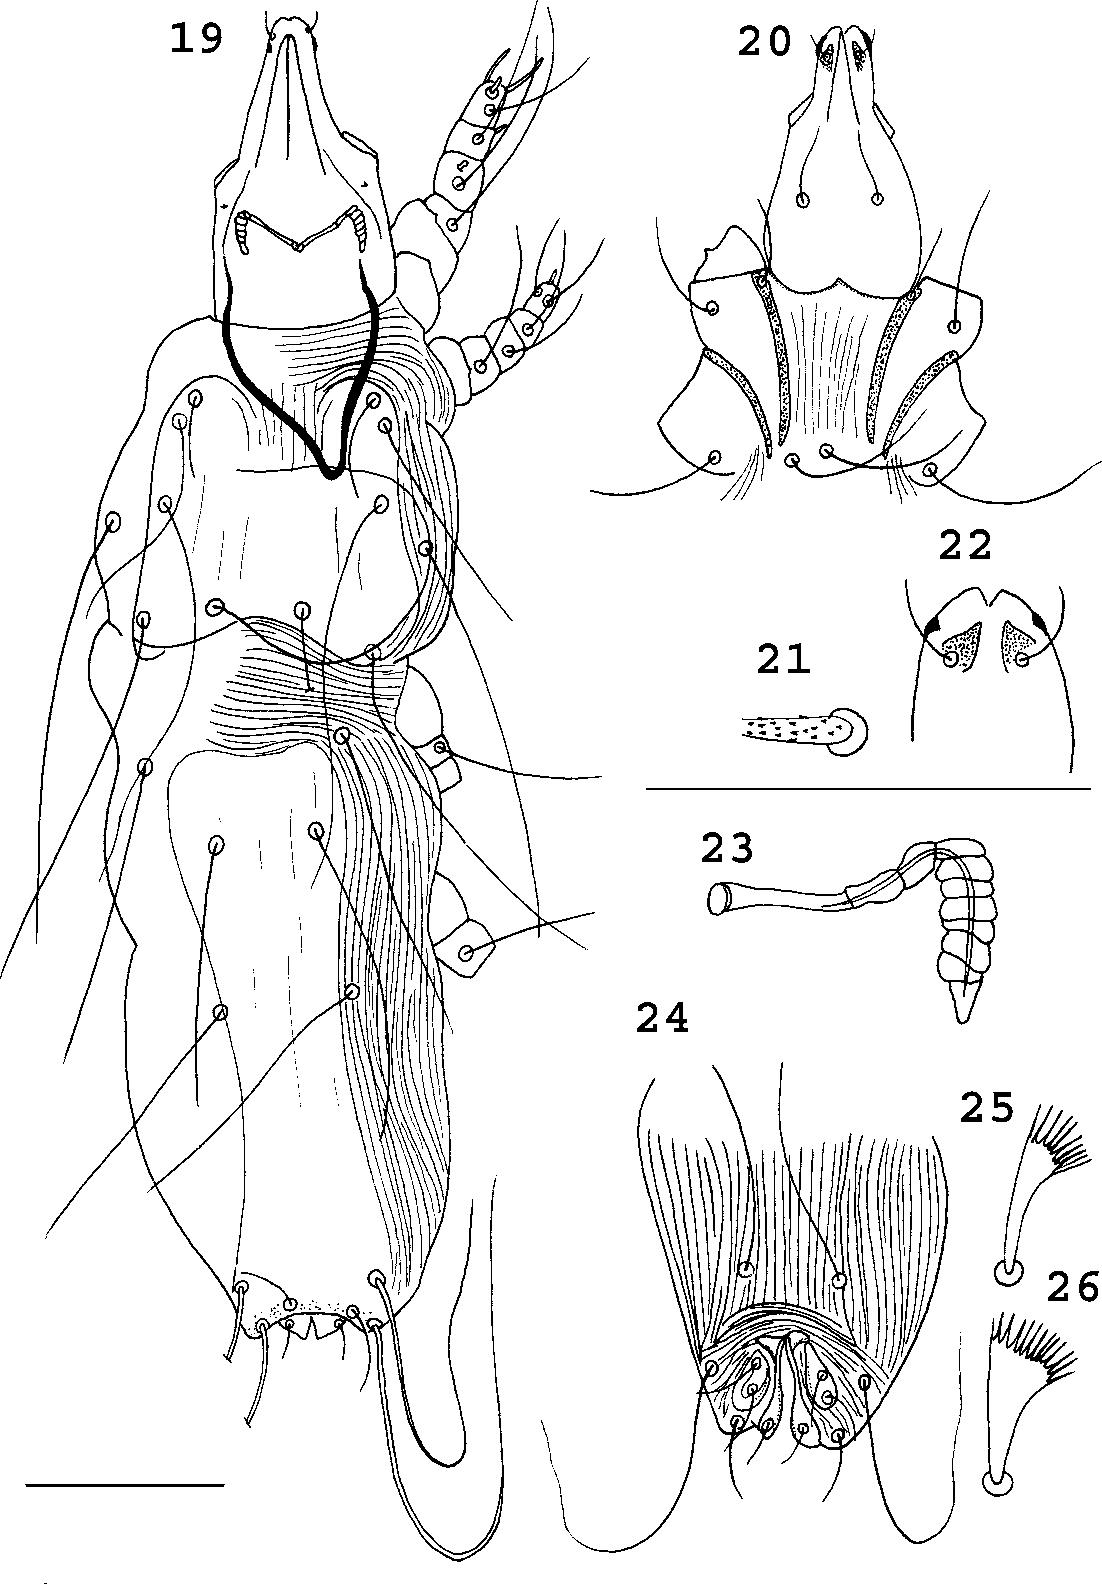 figure 19–26